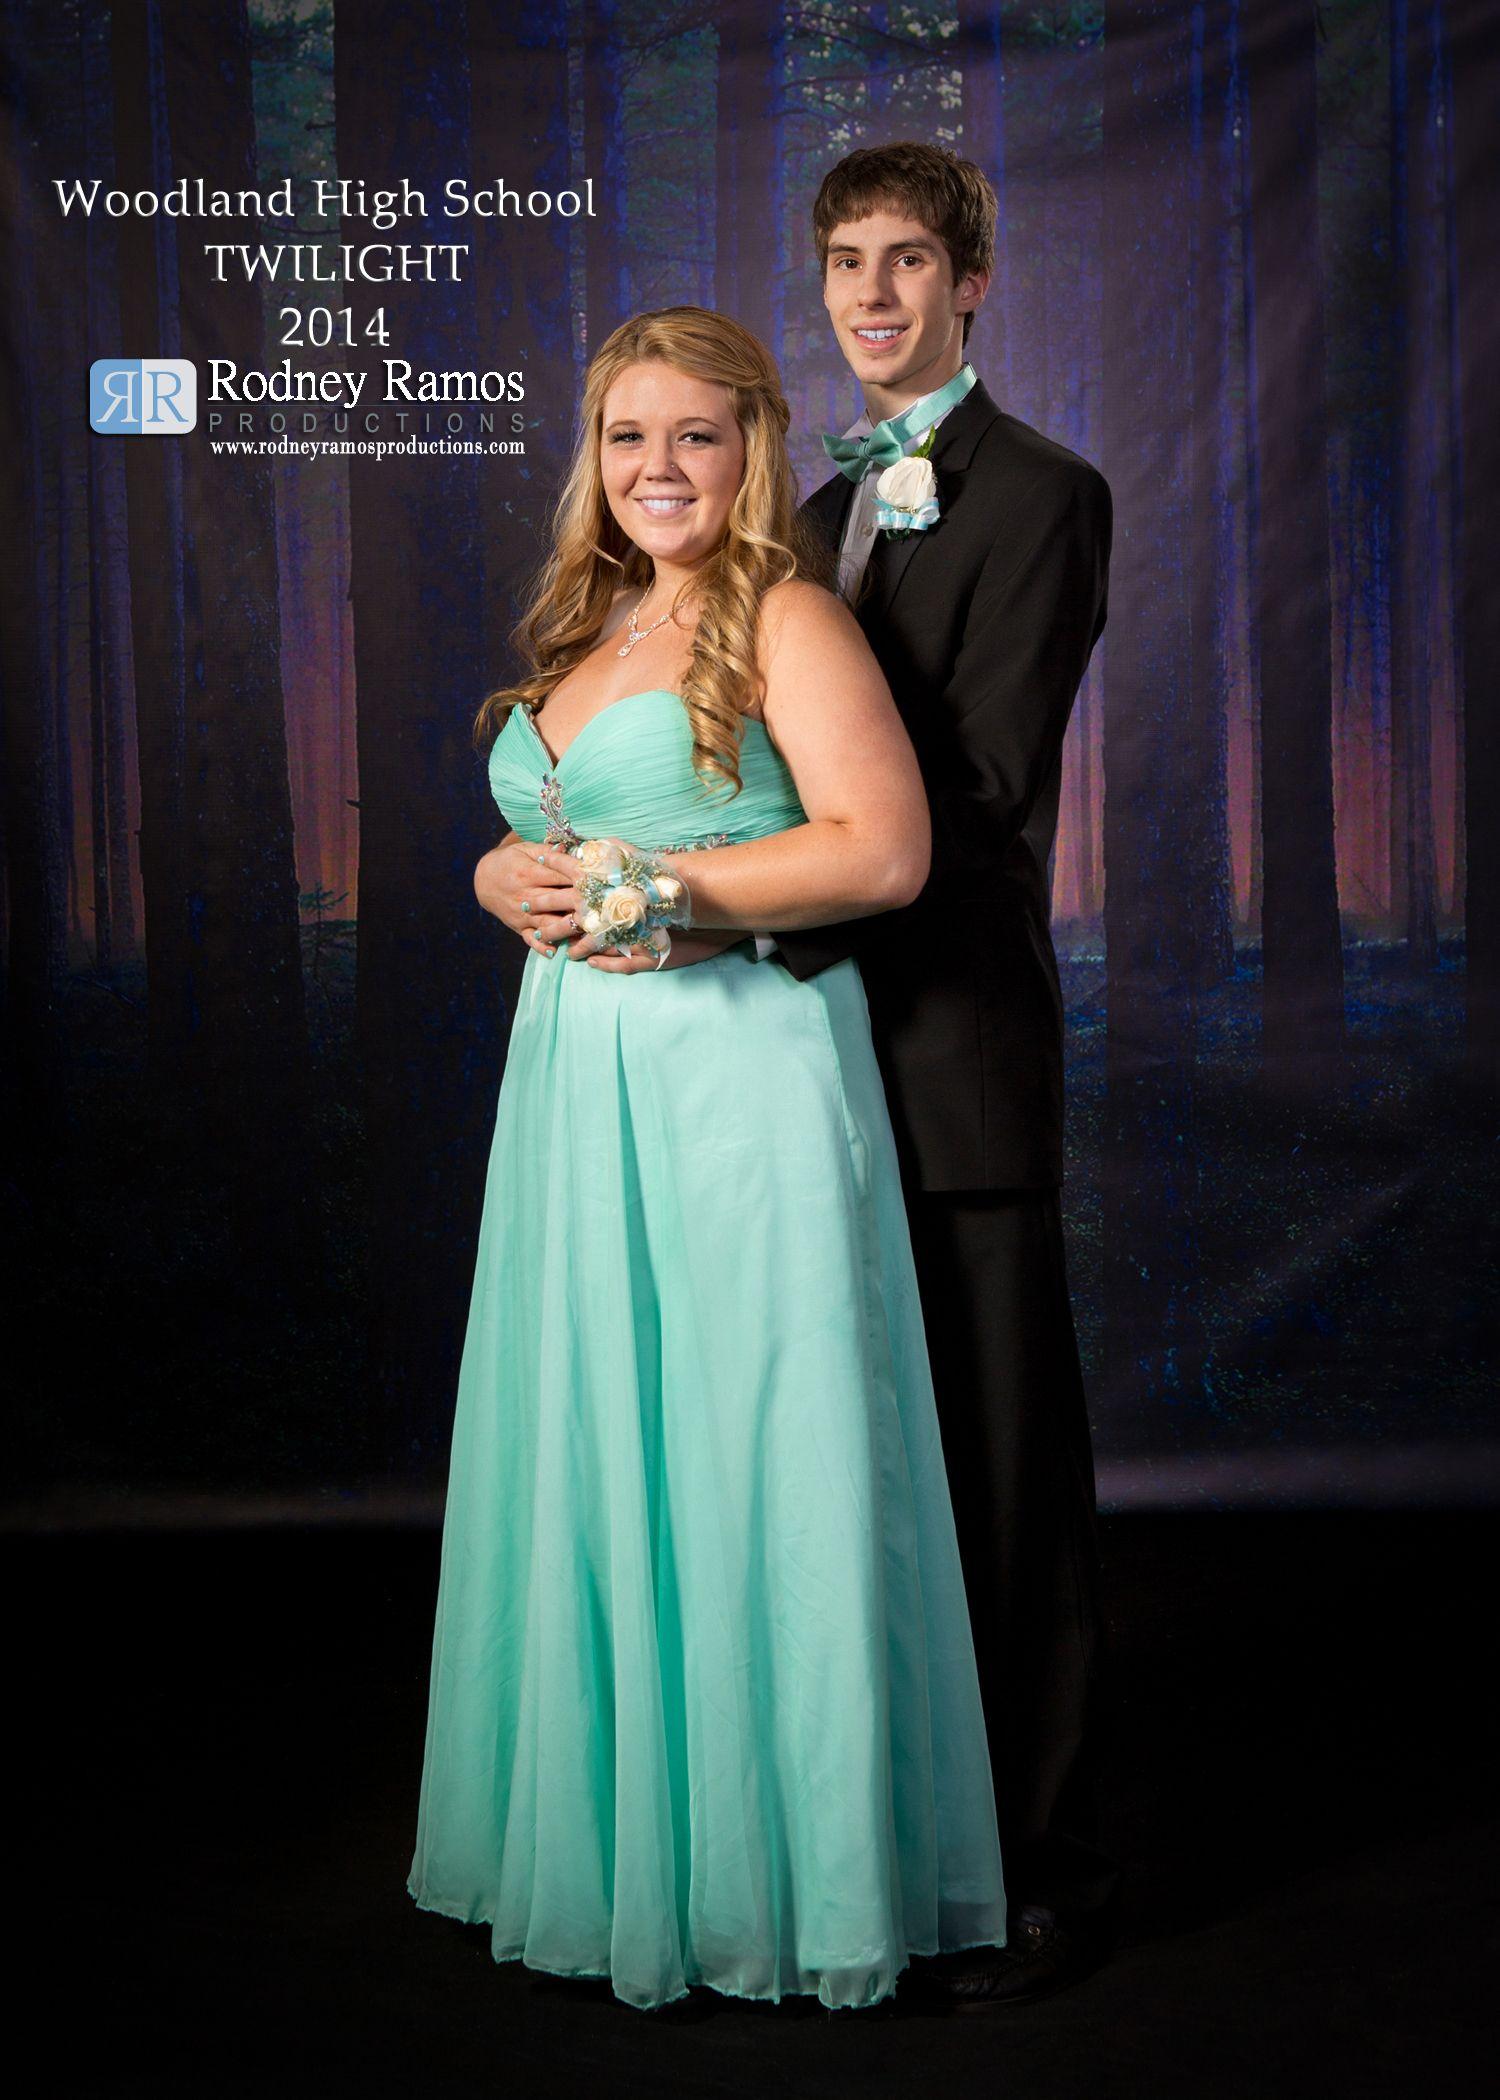 Woodland High School 2014 Twilight Prom Photo Styling By Rodney Ramos Productions C 2014 Rodneyramosproductions Rodneyram Prom Photos Formal Dresses Long Prom [ 2100 x 1500 Pixel ]